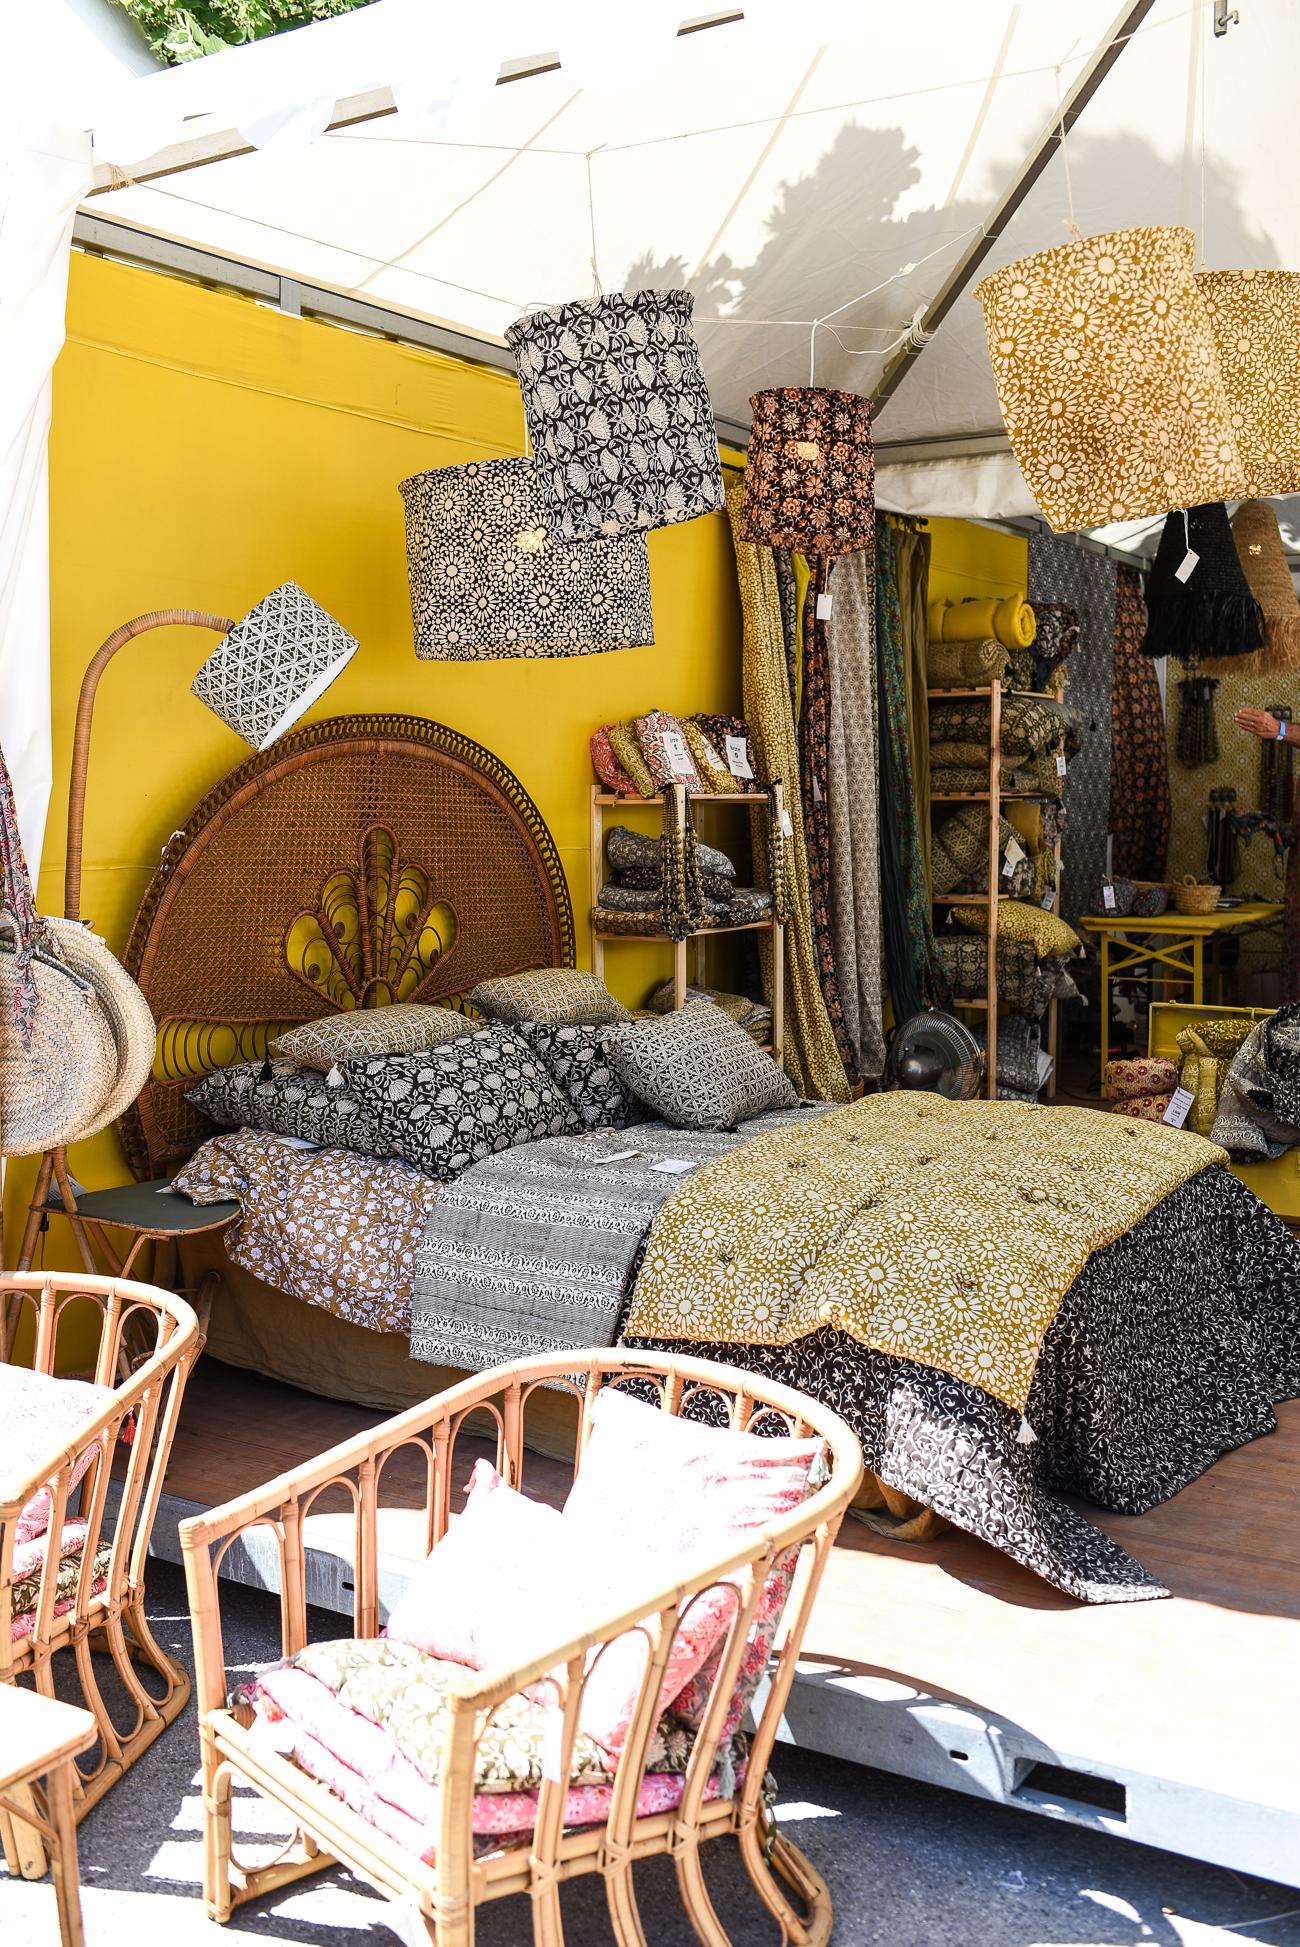 le-studio-twinky-photographe-salon-vivre-cote-sud-2019-aix-en-provence-43.jpg